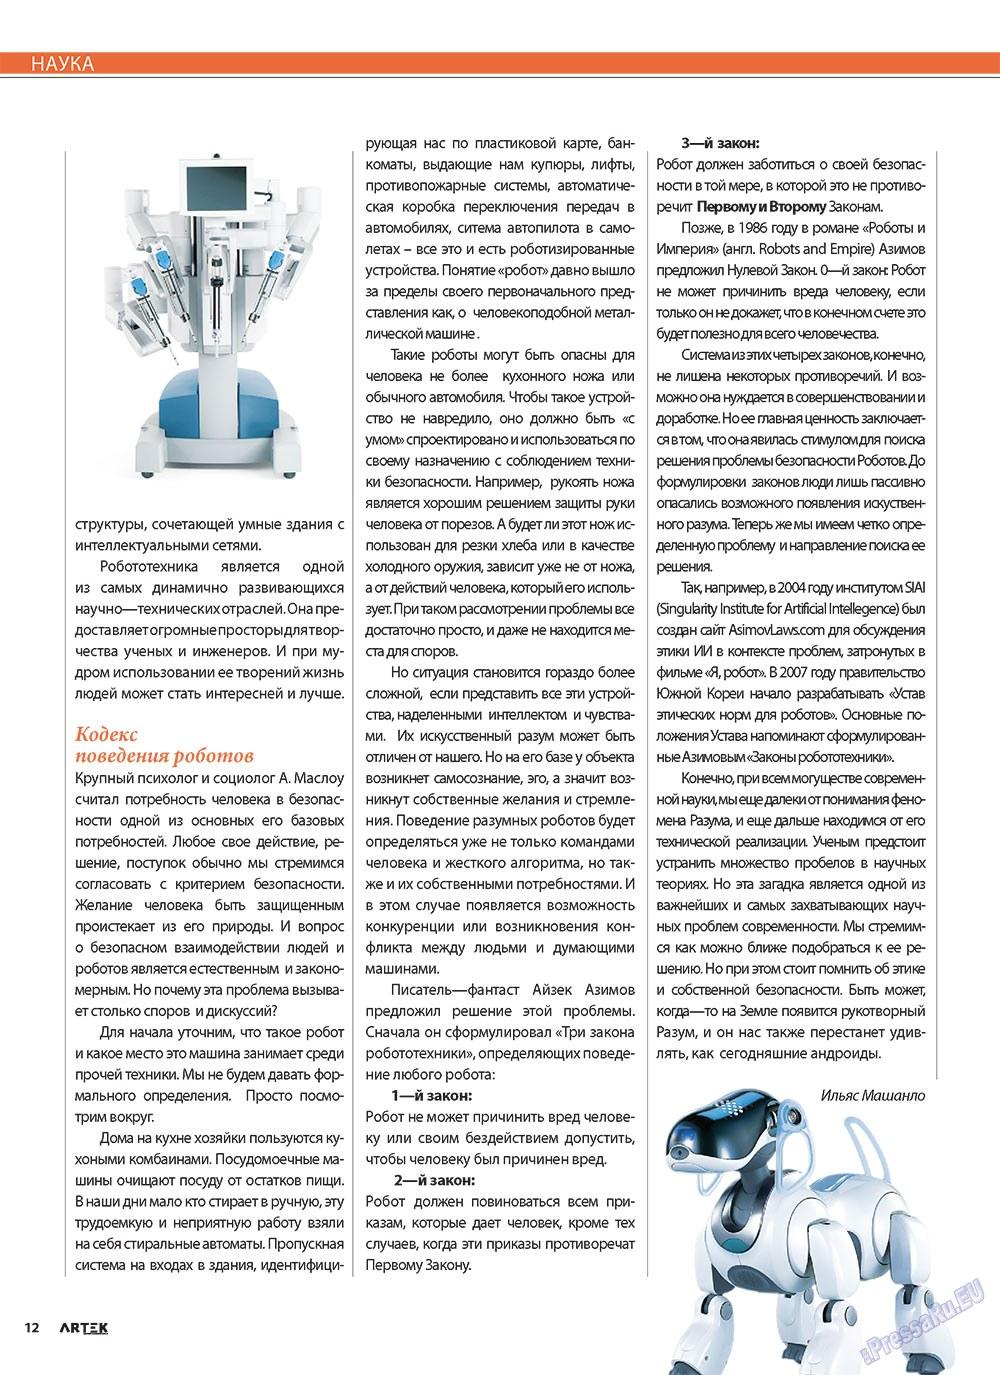 Артек (журнал). 2010 год, номер 6, стр. 14